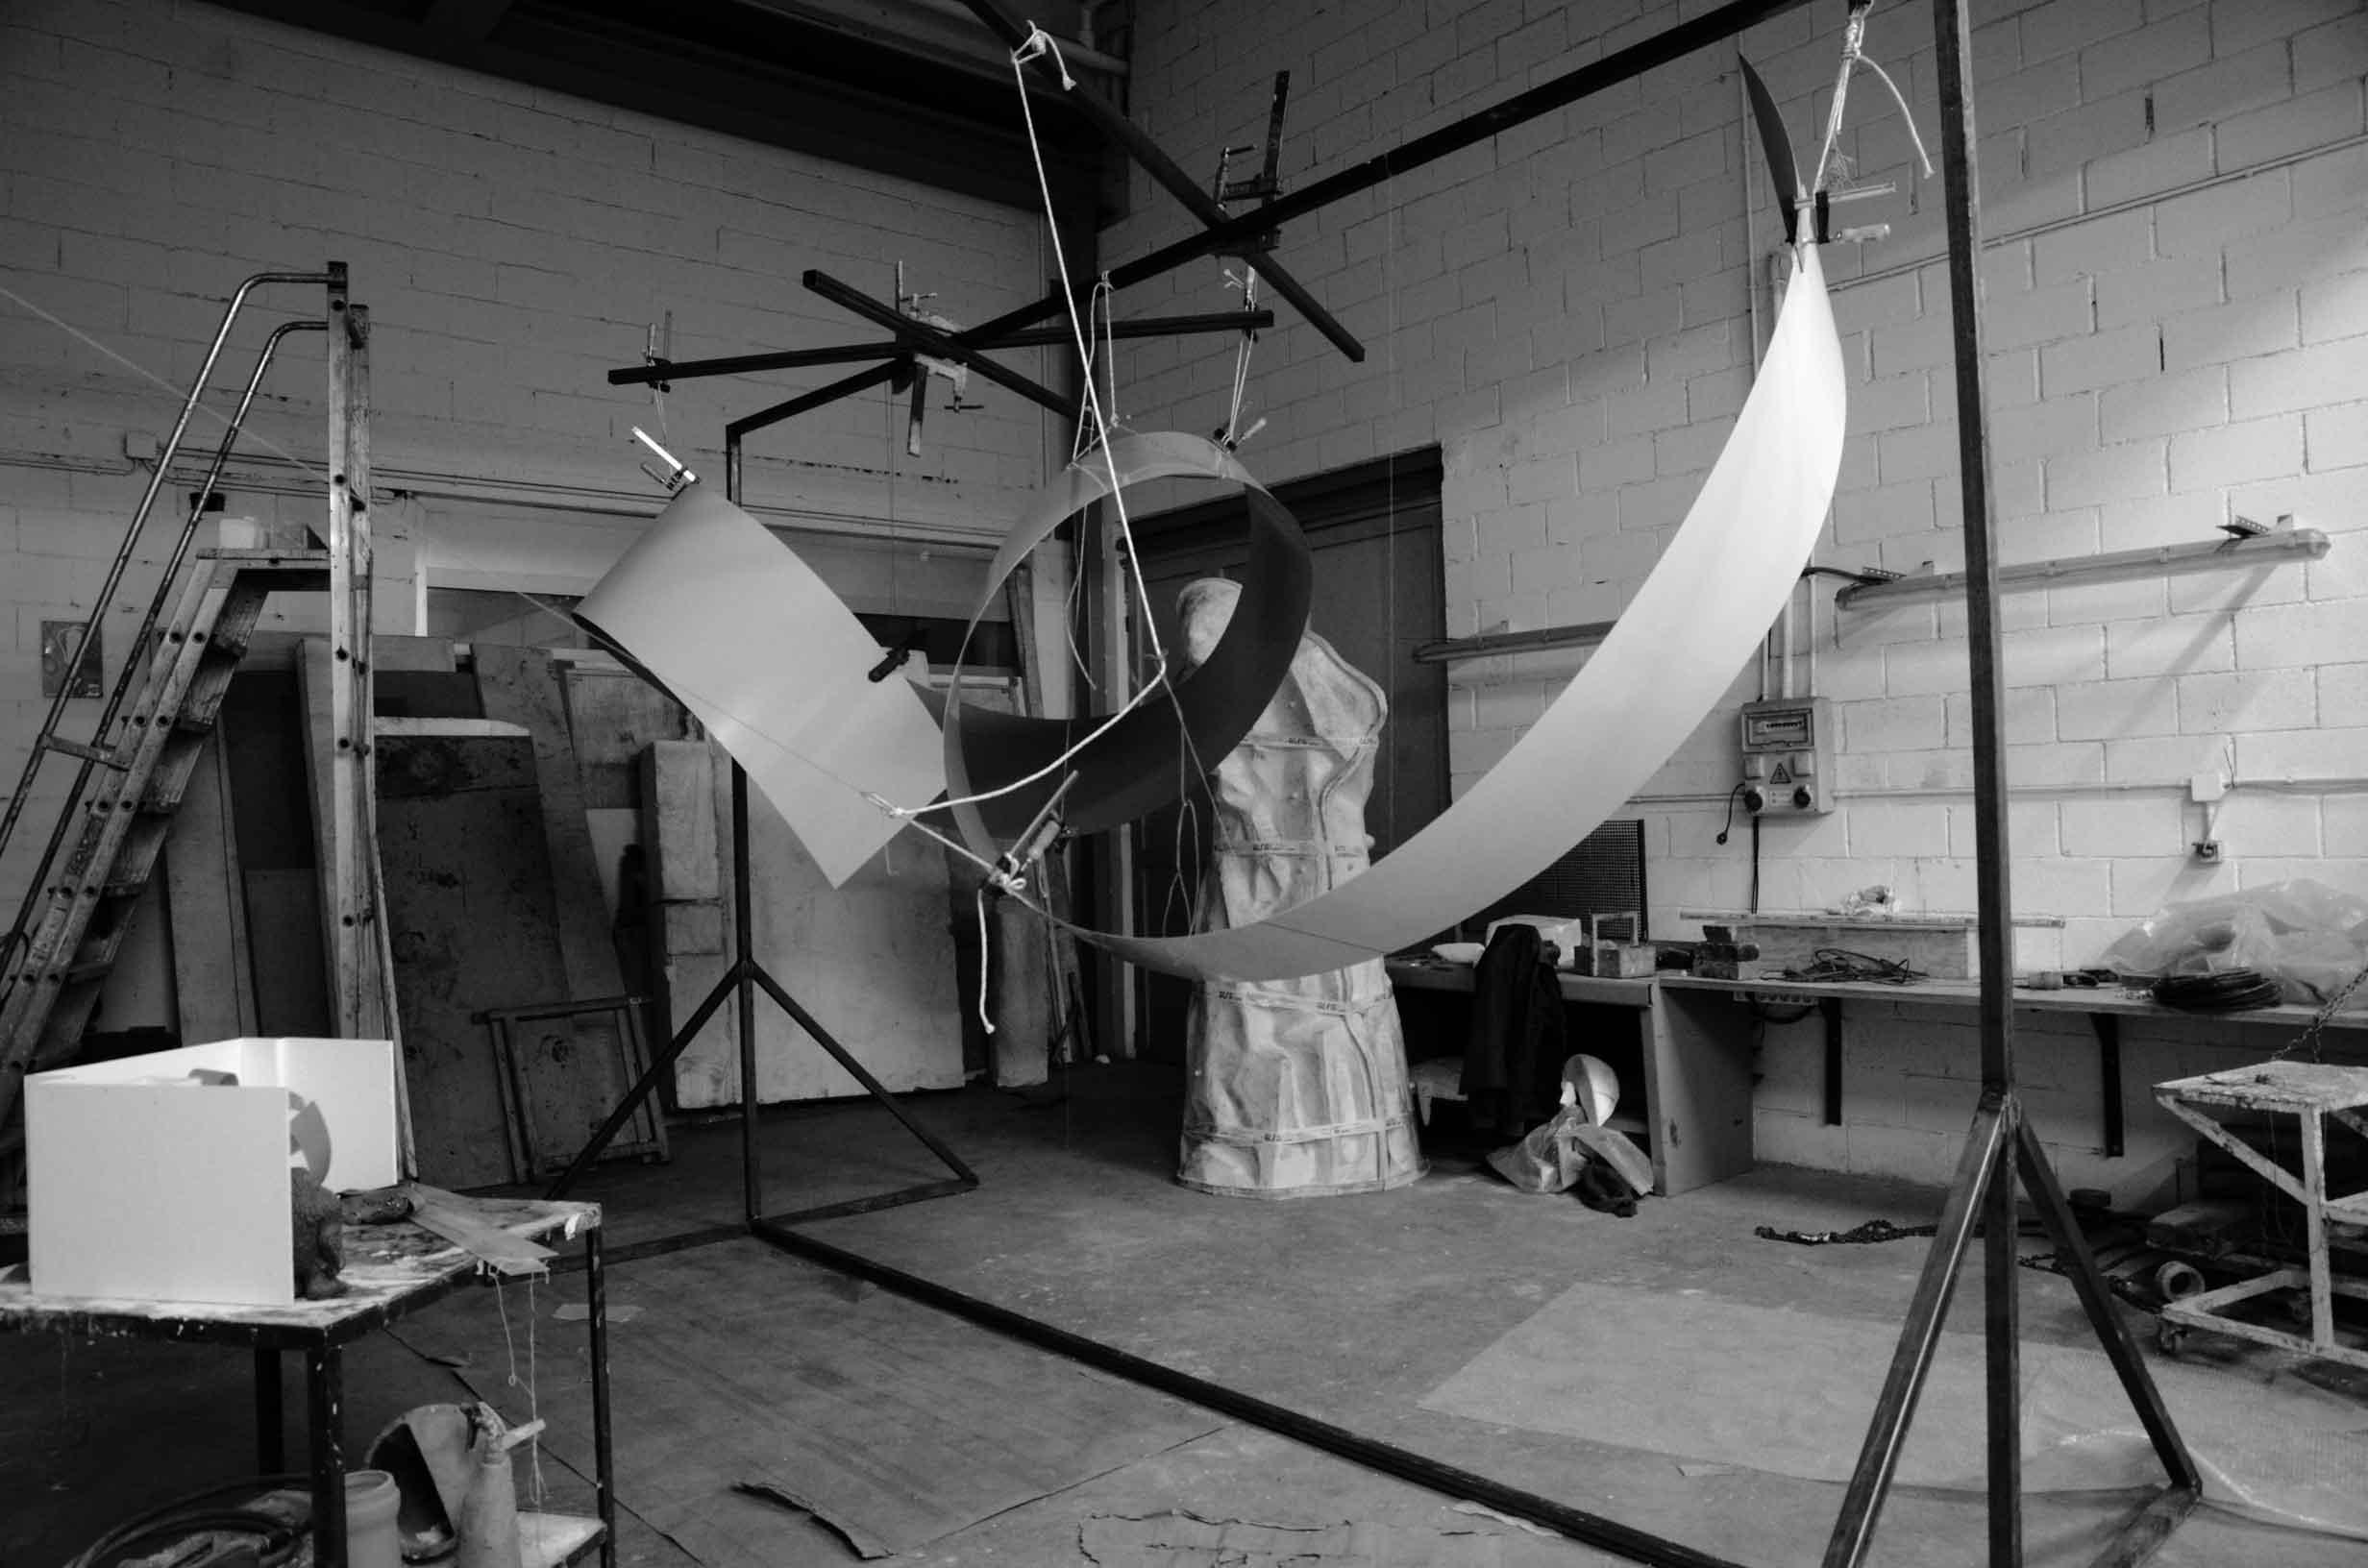 Daniel Canogar, preparation of the work CROSSROAD DKV, in Alfa Arte